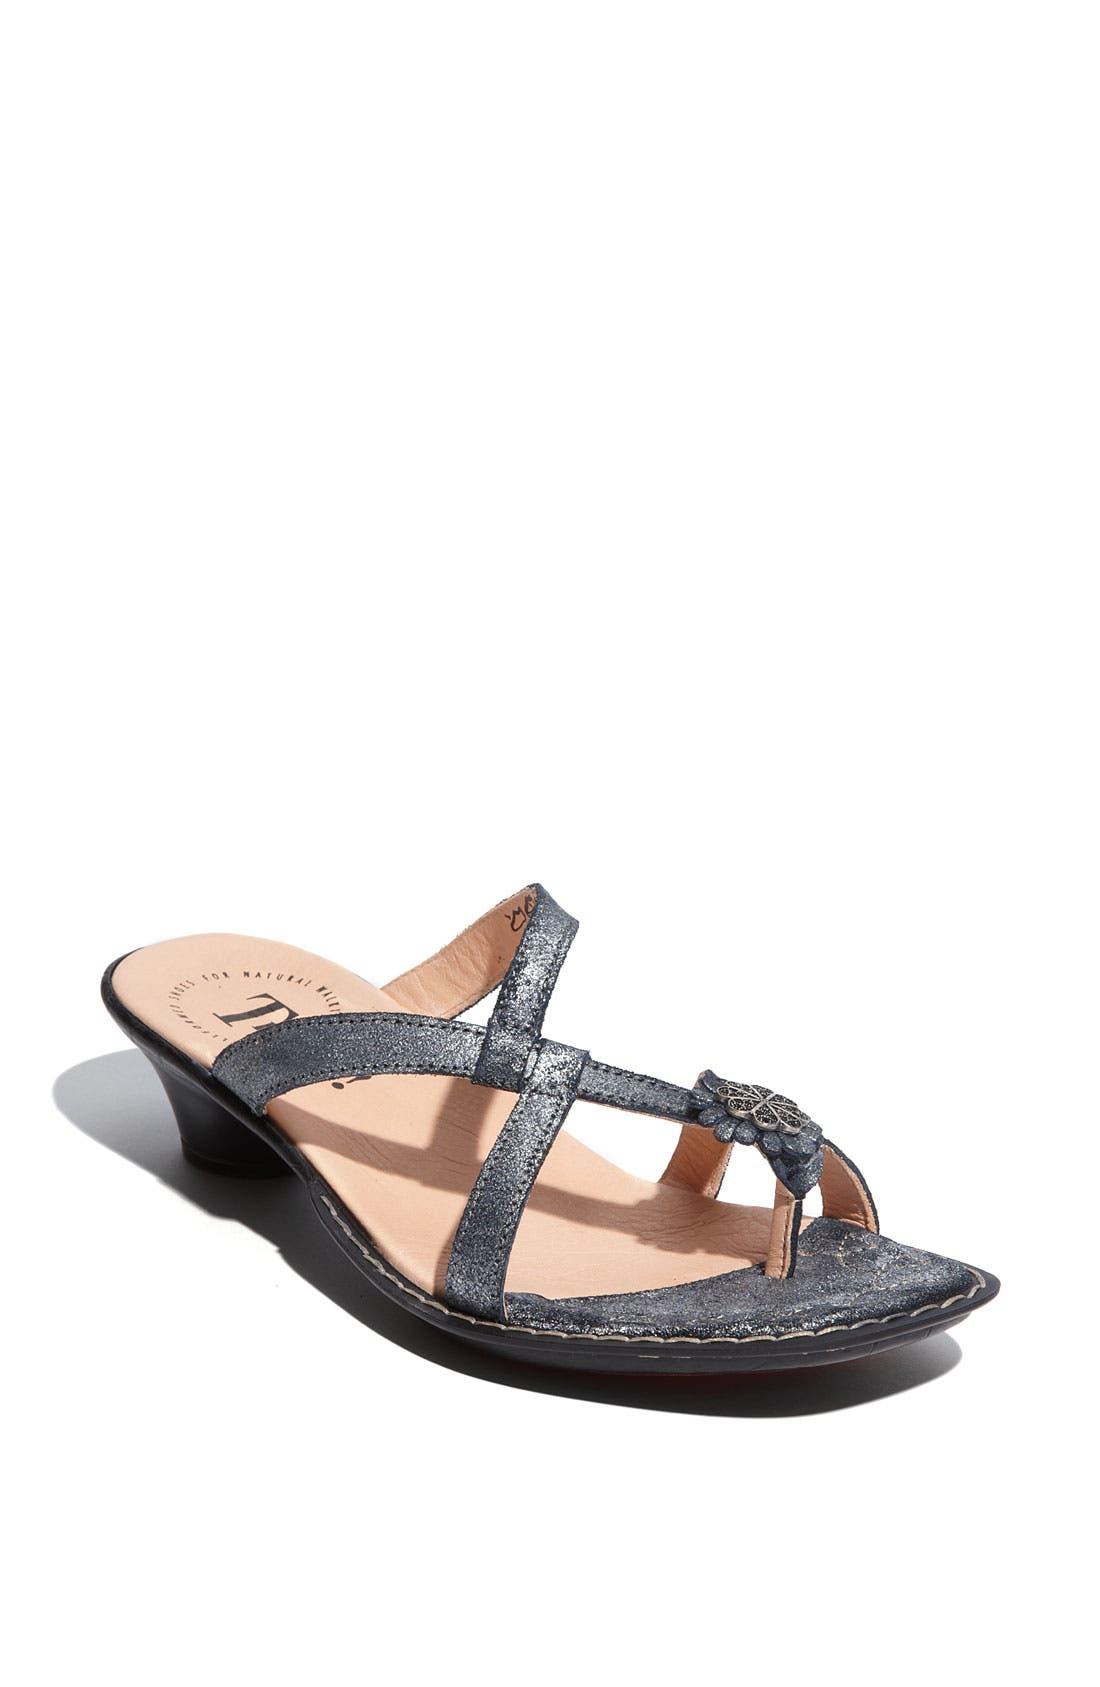 Alternate Image 1 Selected - Think! 'Soso' Metallic Leather Sandal